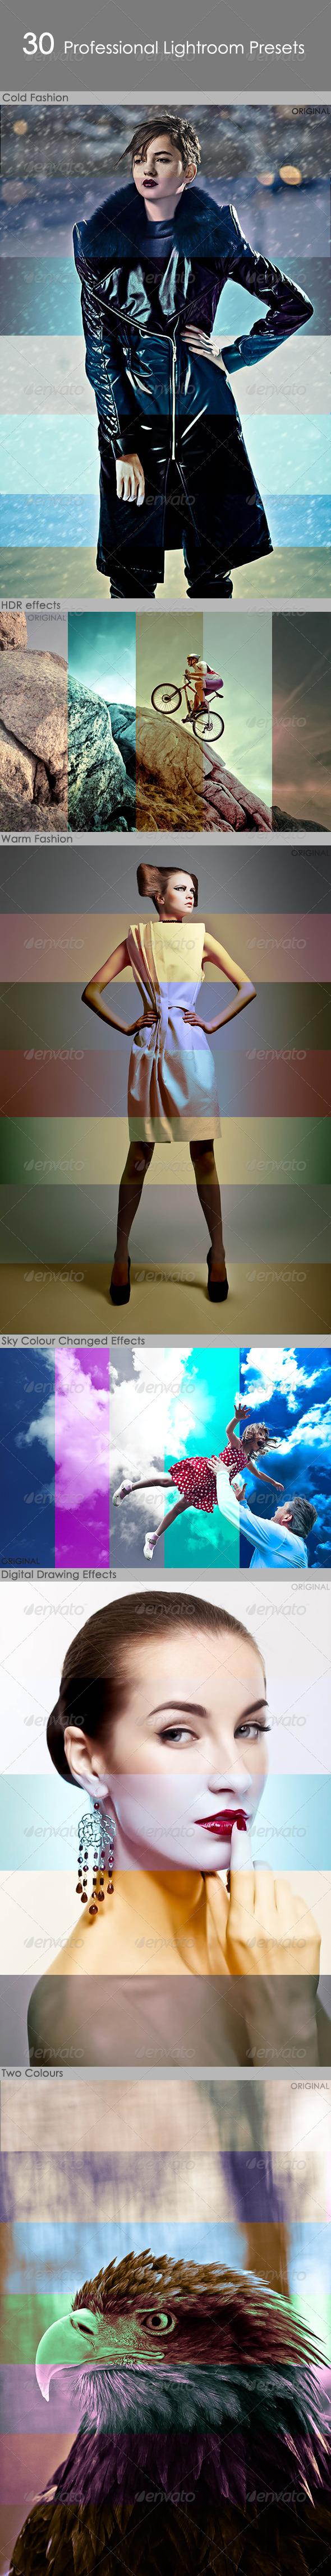 GraphicRiver 30 Professional Lightroom Presets 5585498